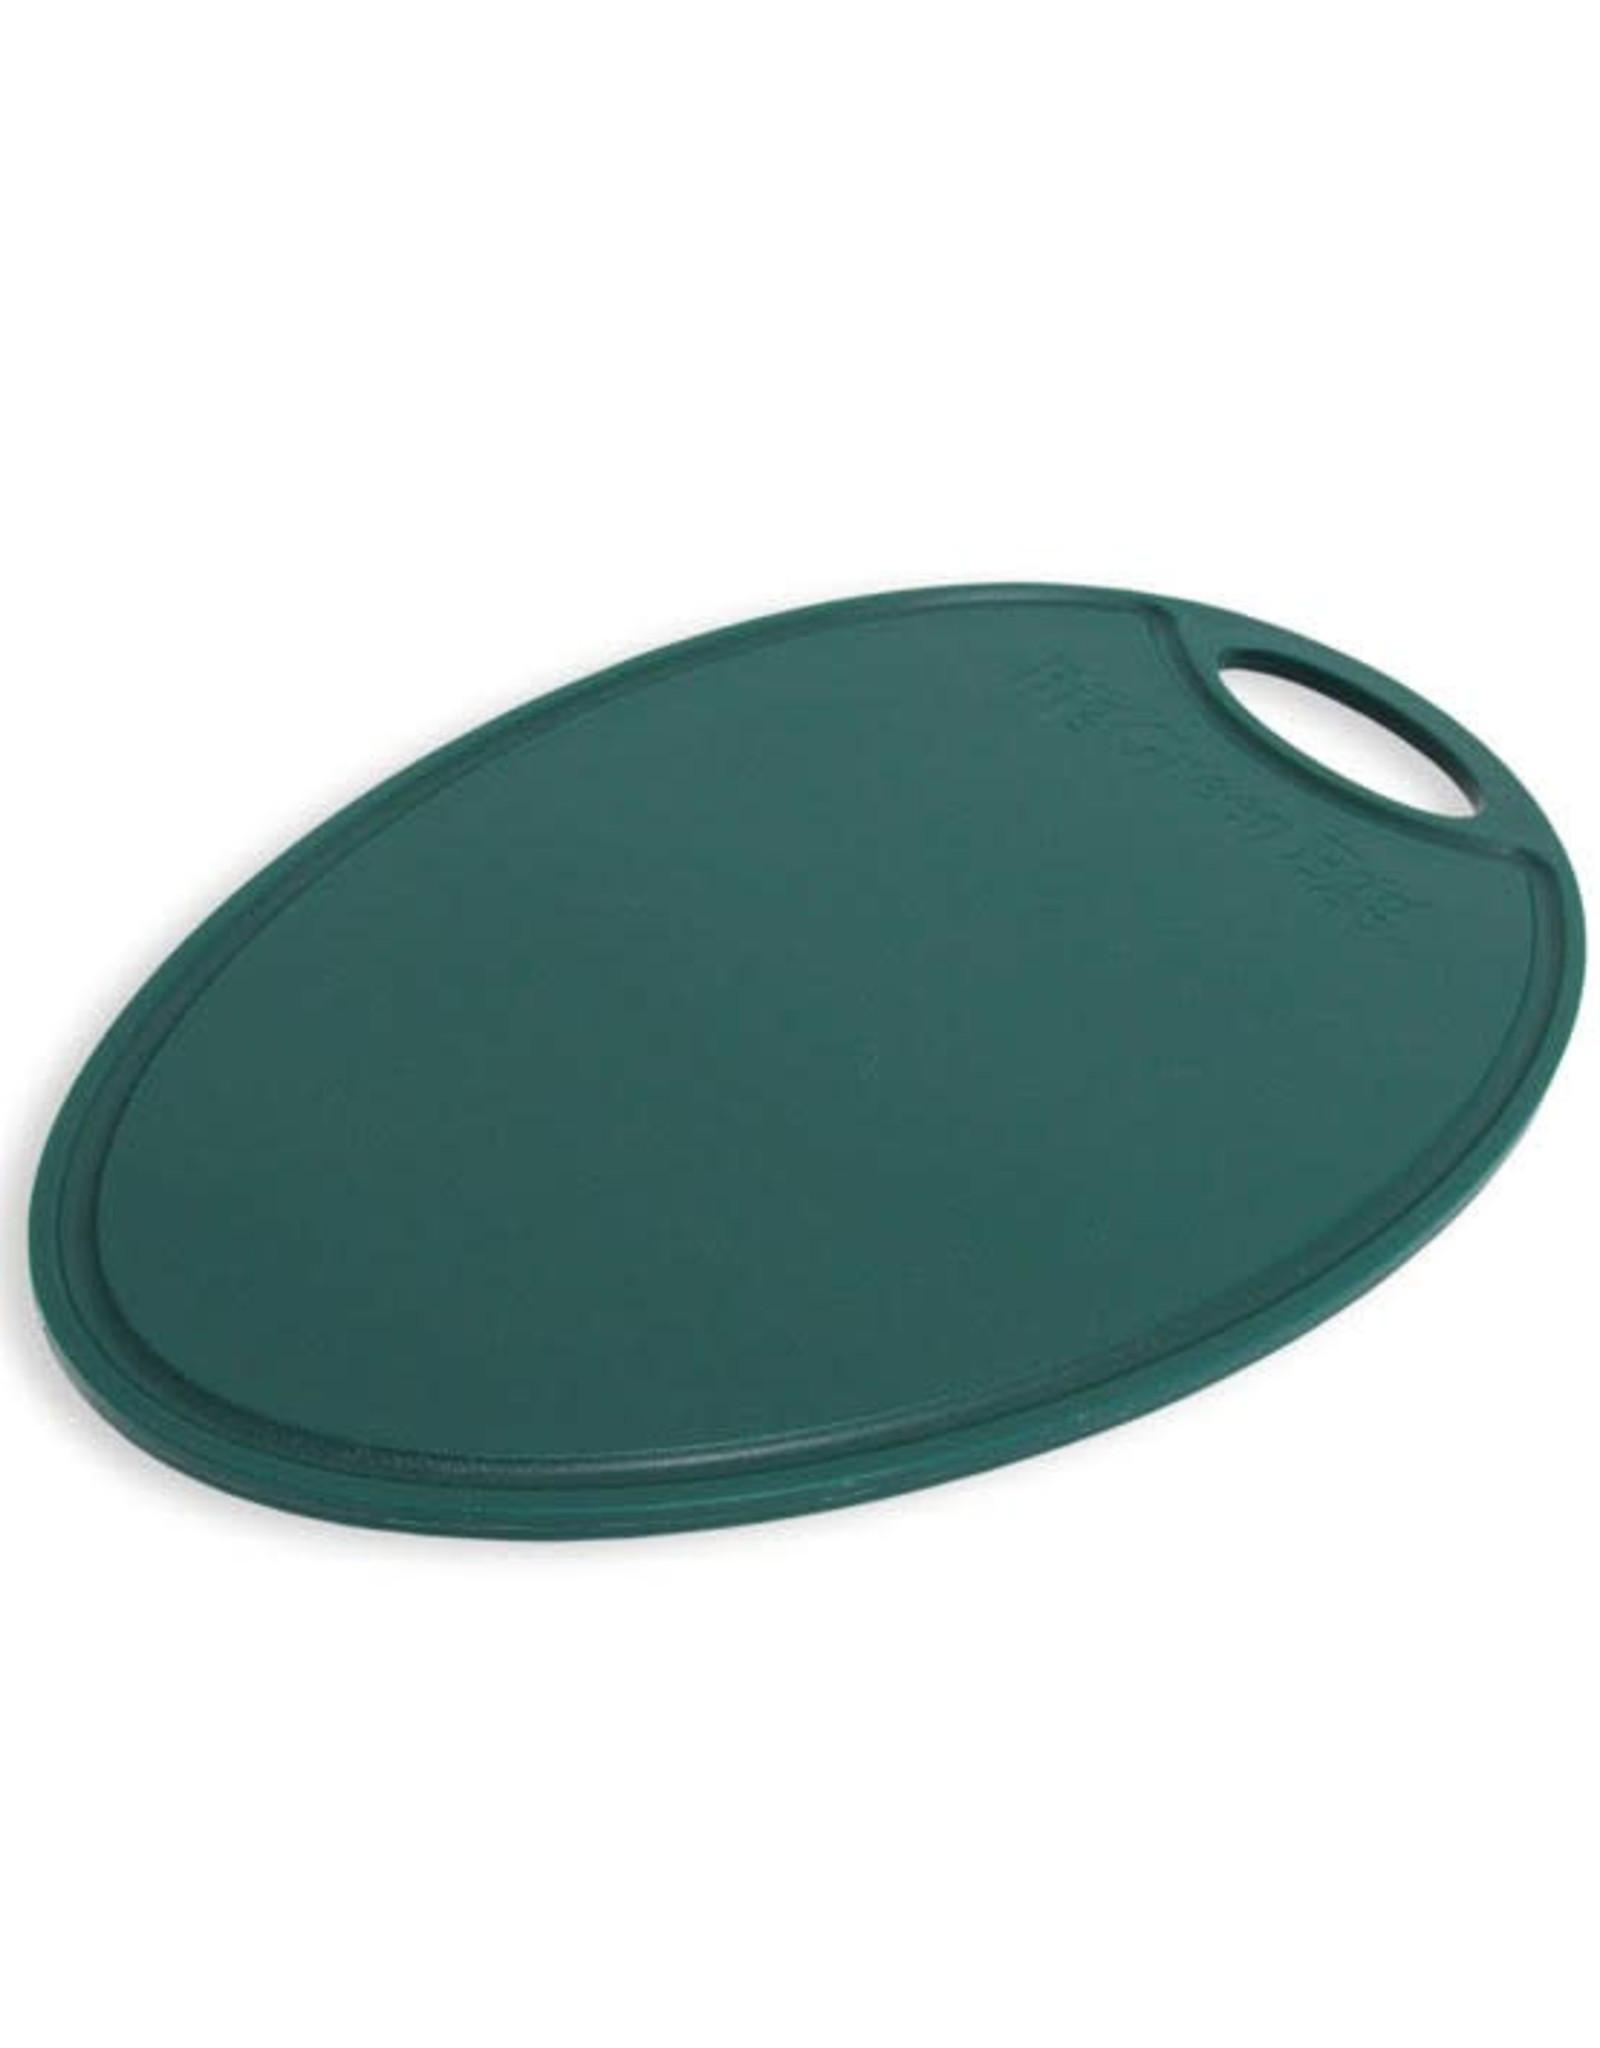 Big Green Egg Big Green Egg - Cutting Board Resin 18''